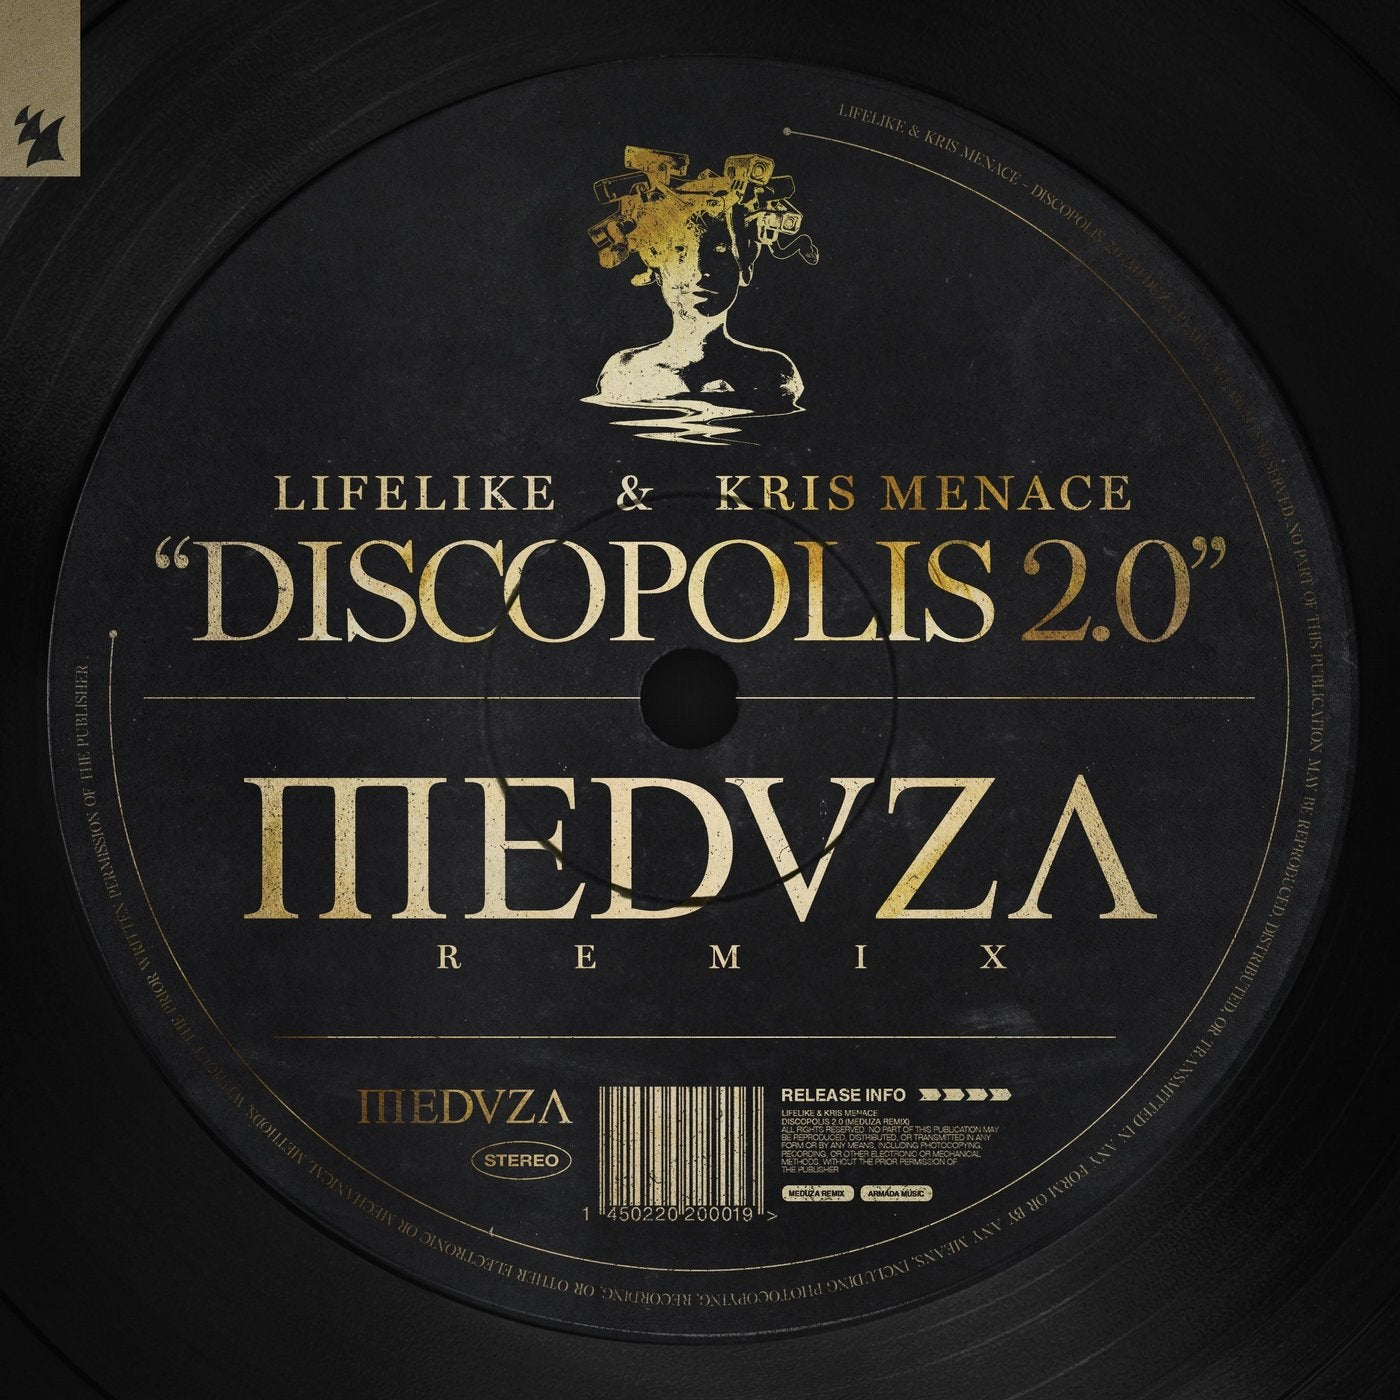 Discopolis 2.0 (MEDUZA Extended Remix)